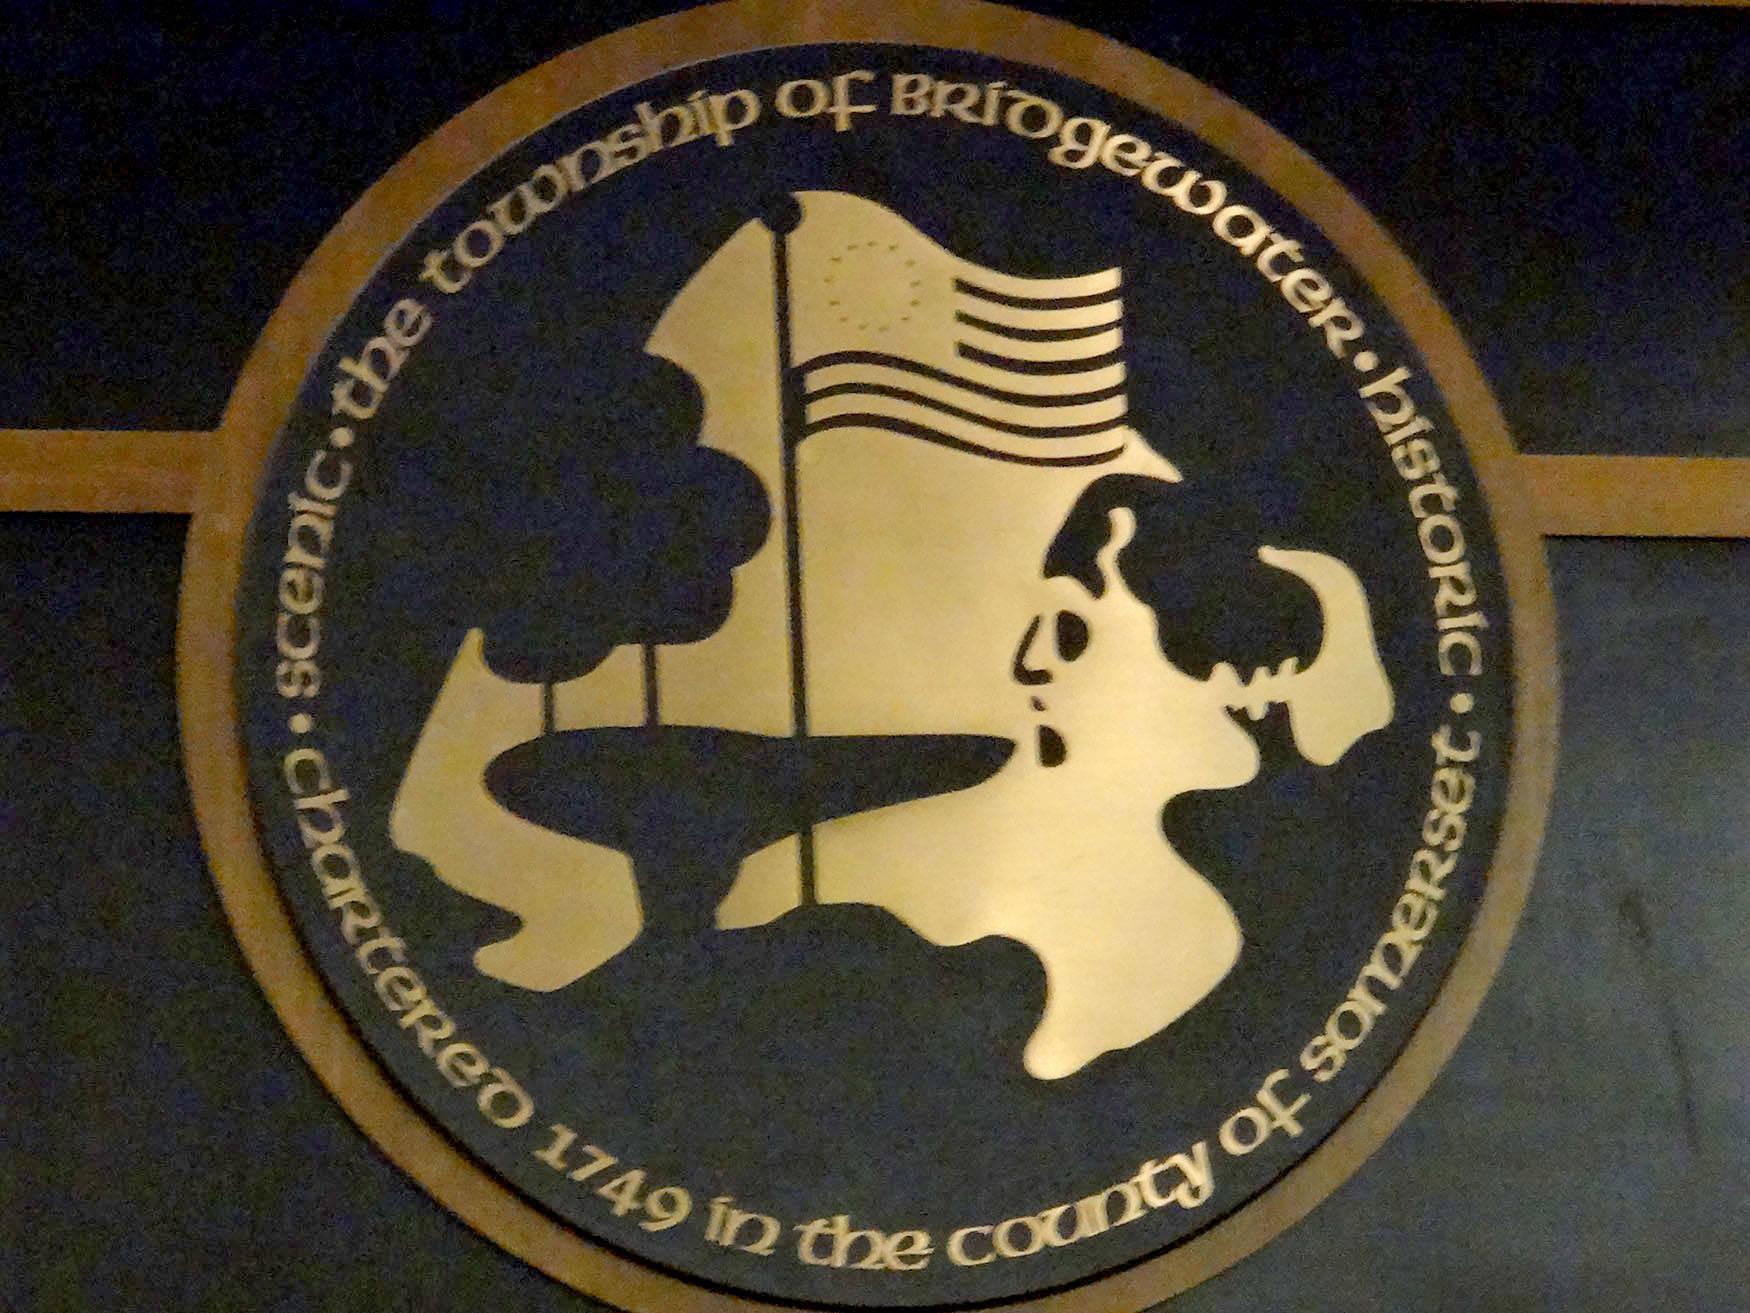 fa9798a65e2ca97ed78b_Bridgewater_symbol.jpg